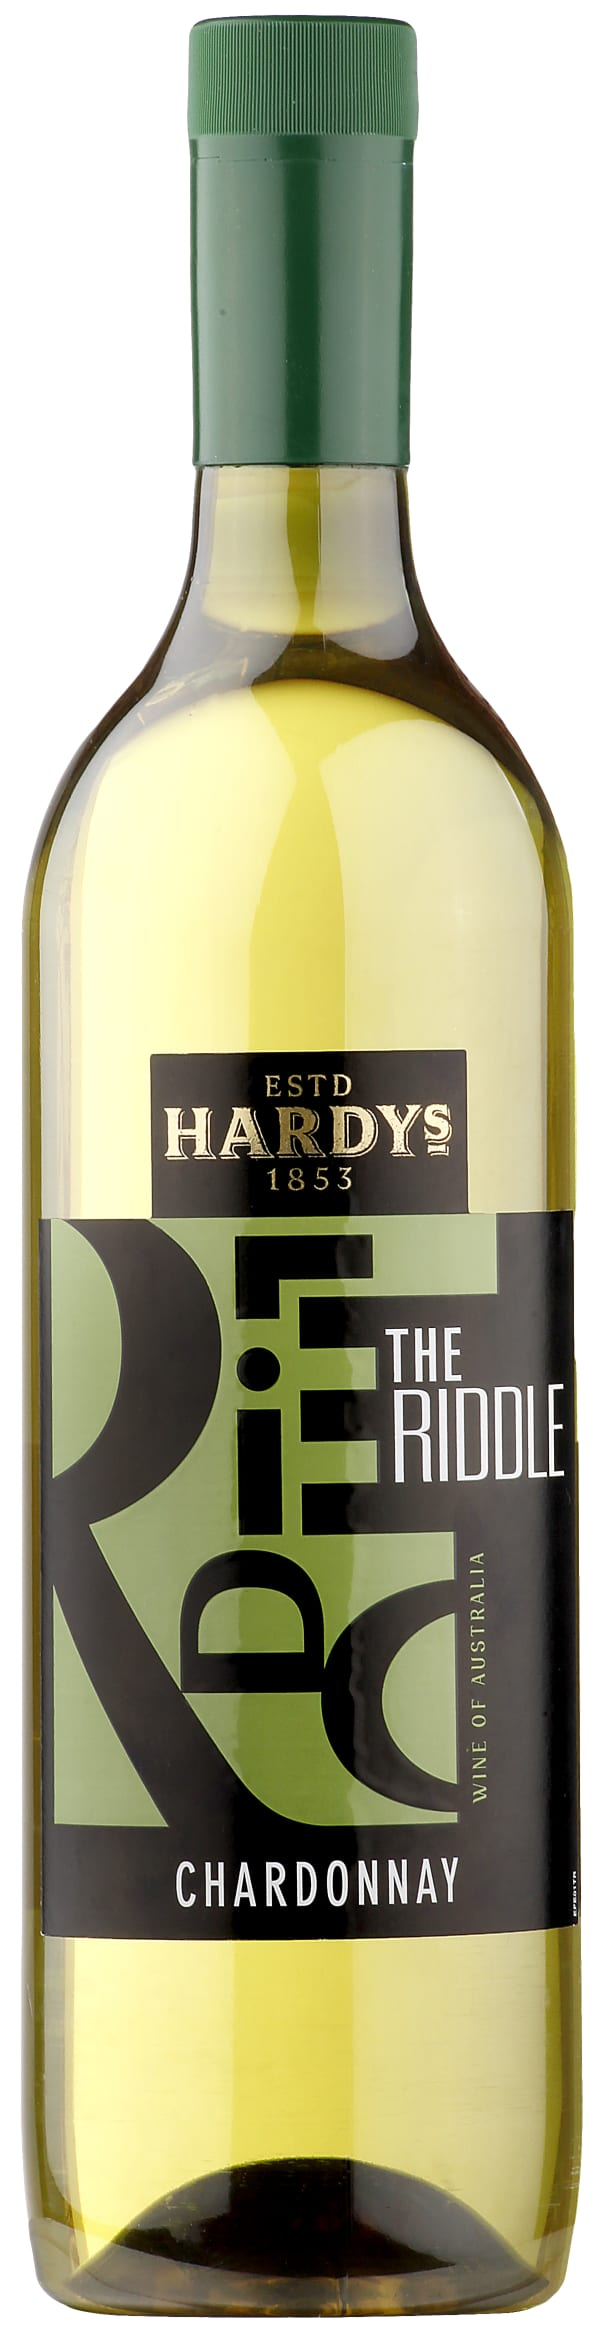 Hardys The Riddle Chardonnay 2016 plastflaska